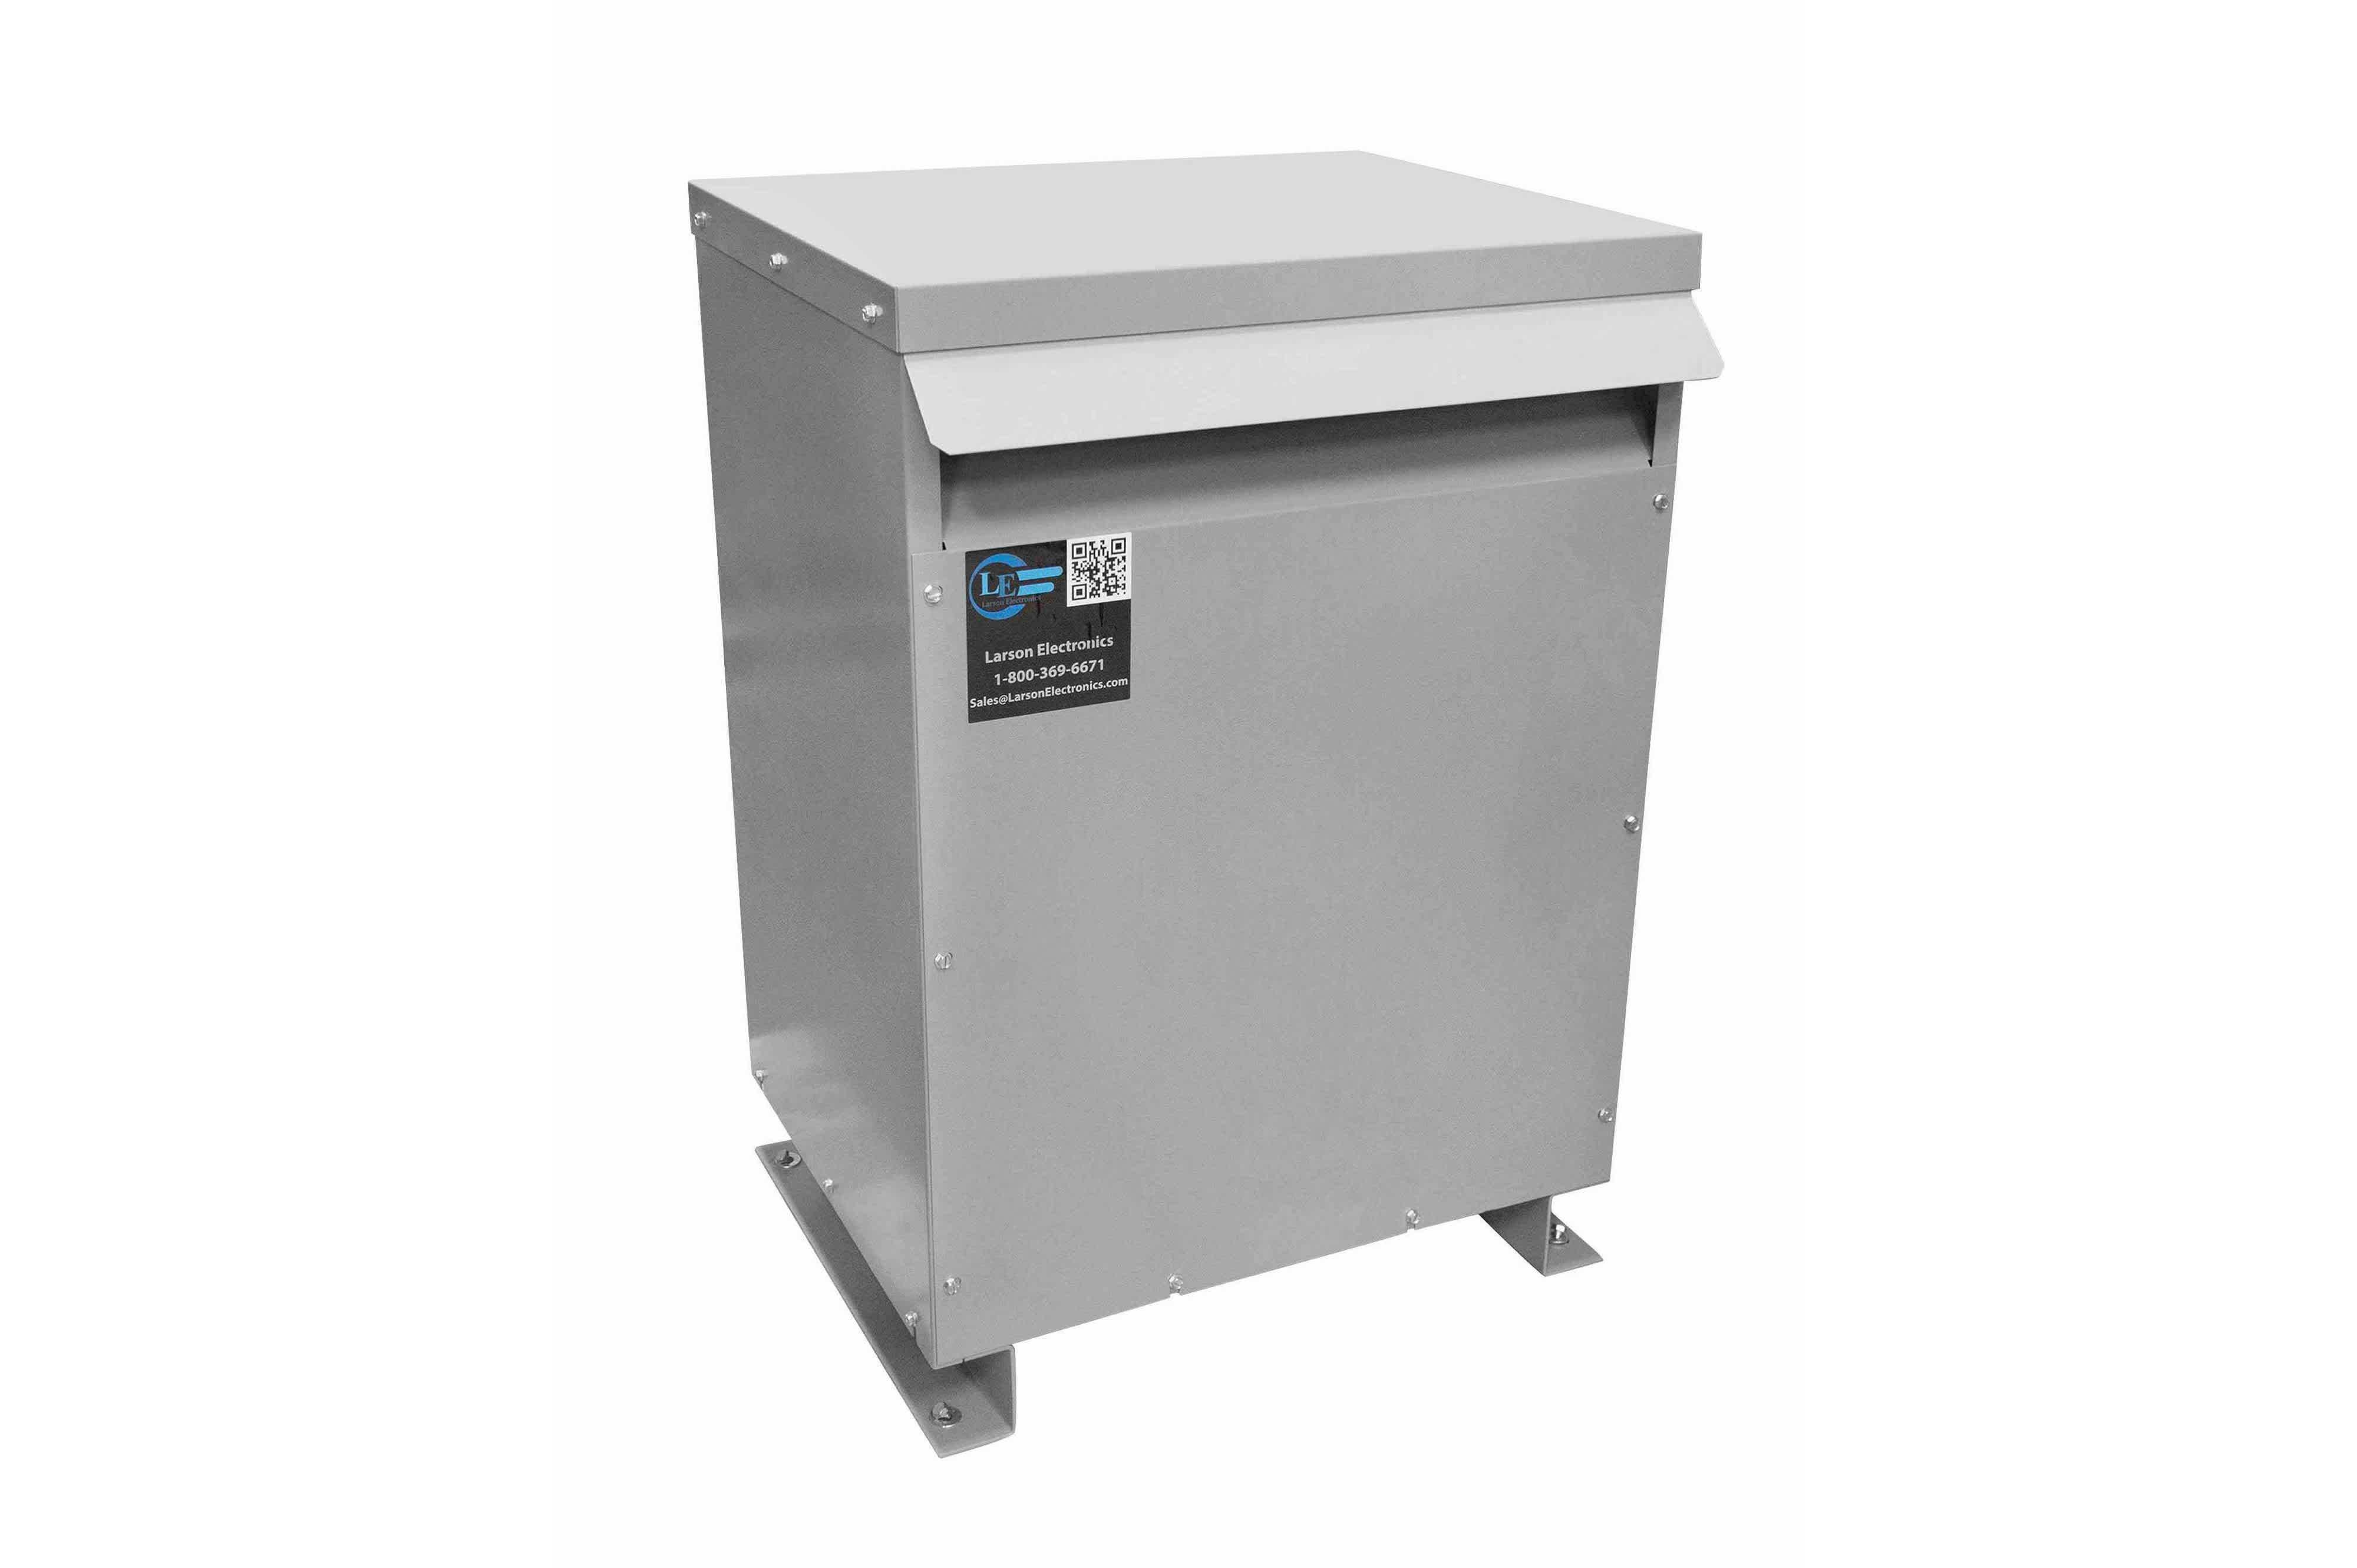 13 kVA 3PH Isolation Transformer, 460V Wye Primary, 575V Delta Secondary, N3R, Ventilated, 60 Hz